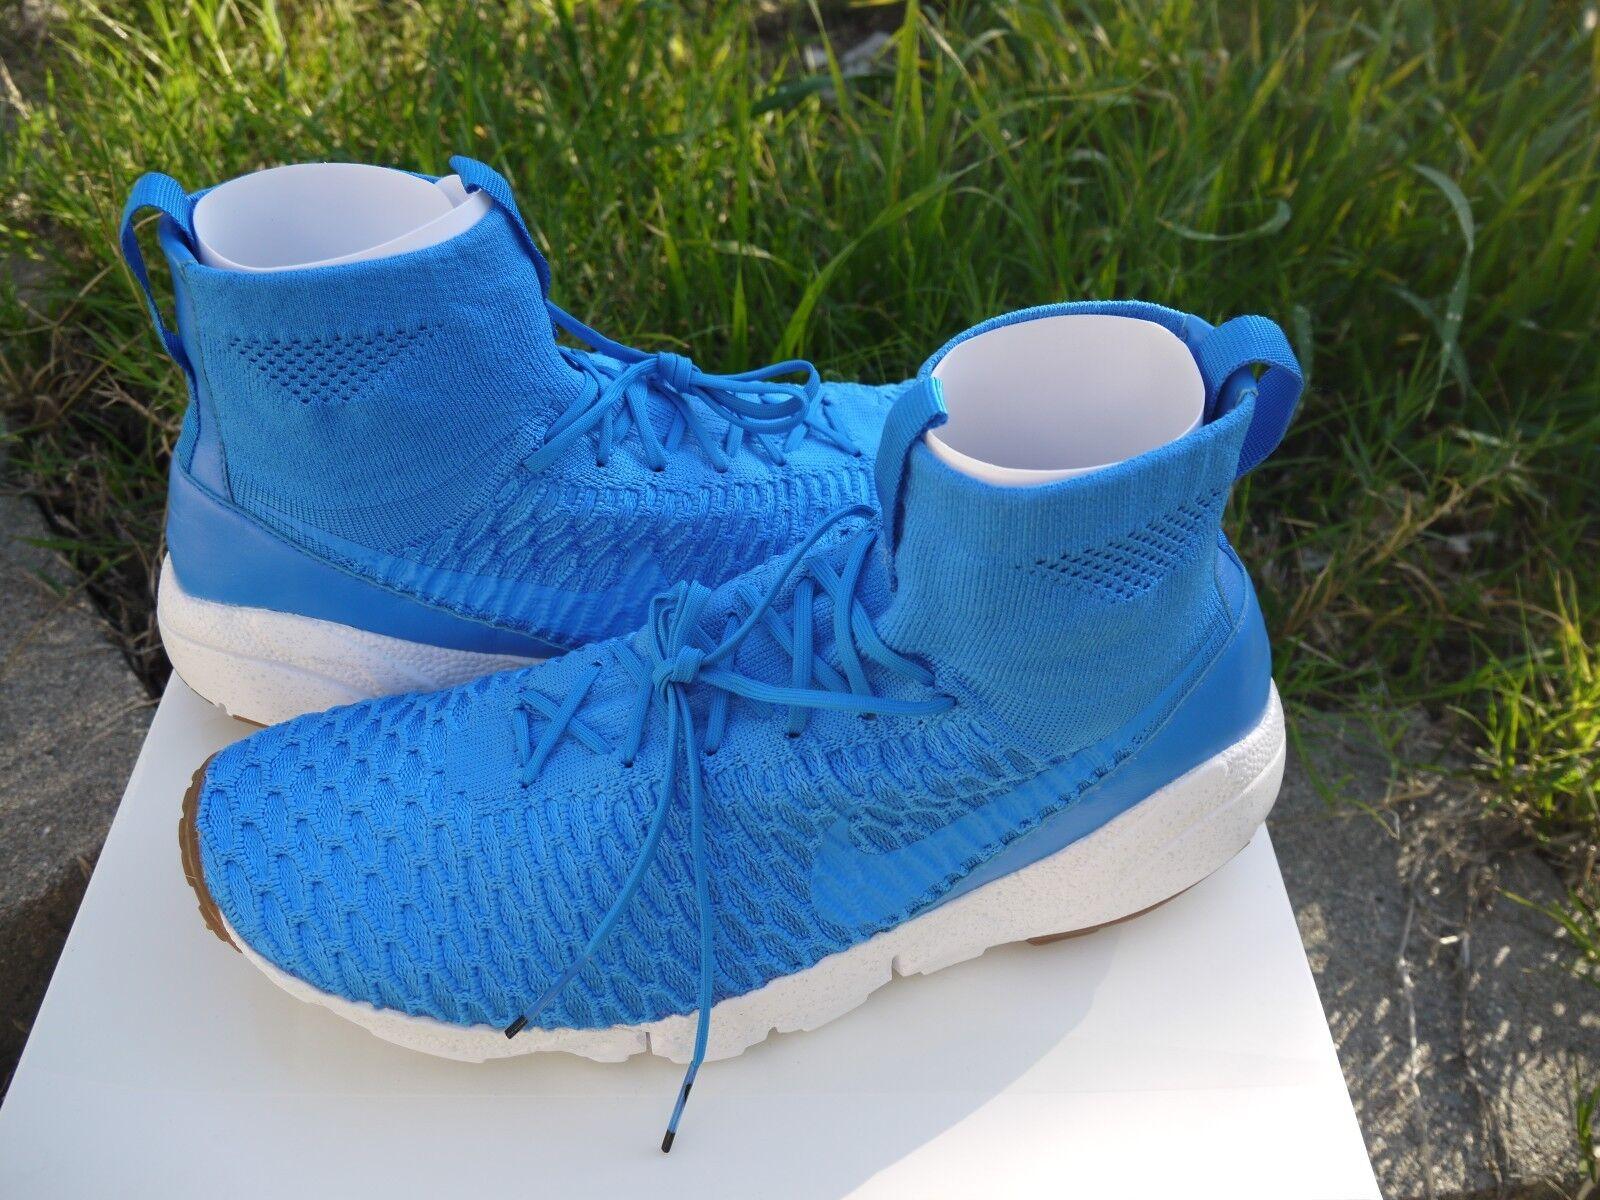 Nike Air Footscape Magista SP Photo Blue size 9.5